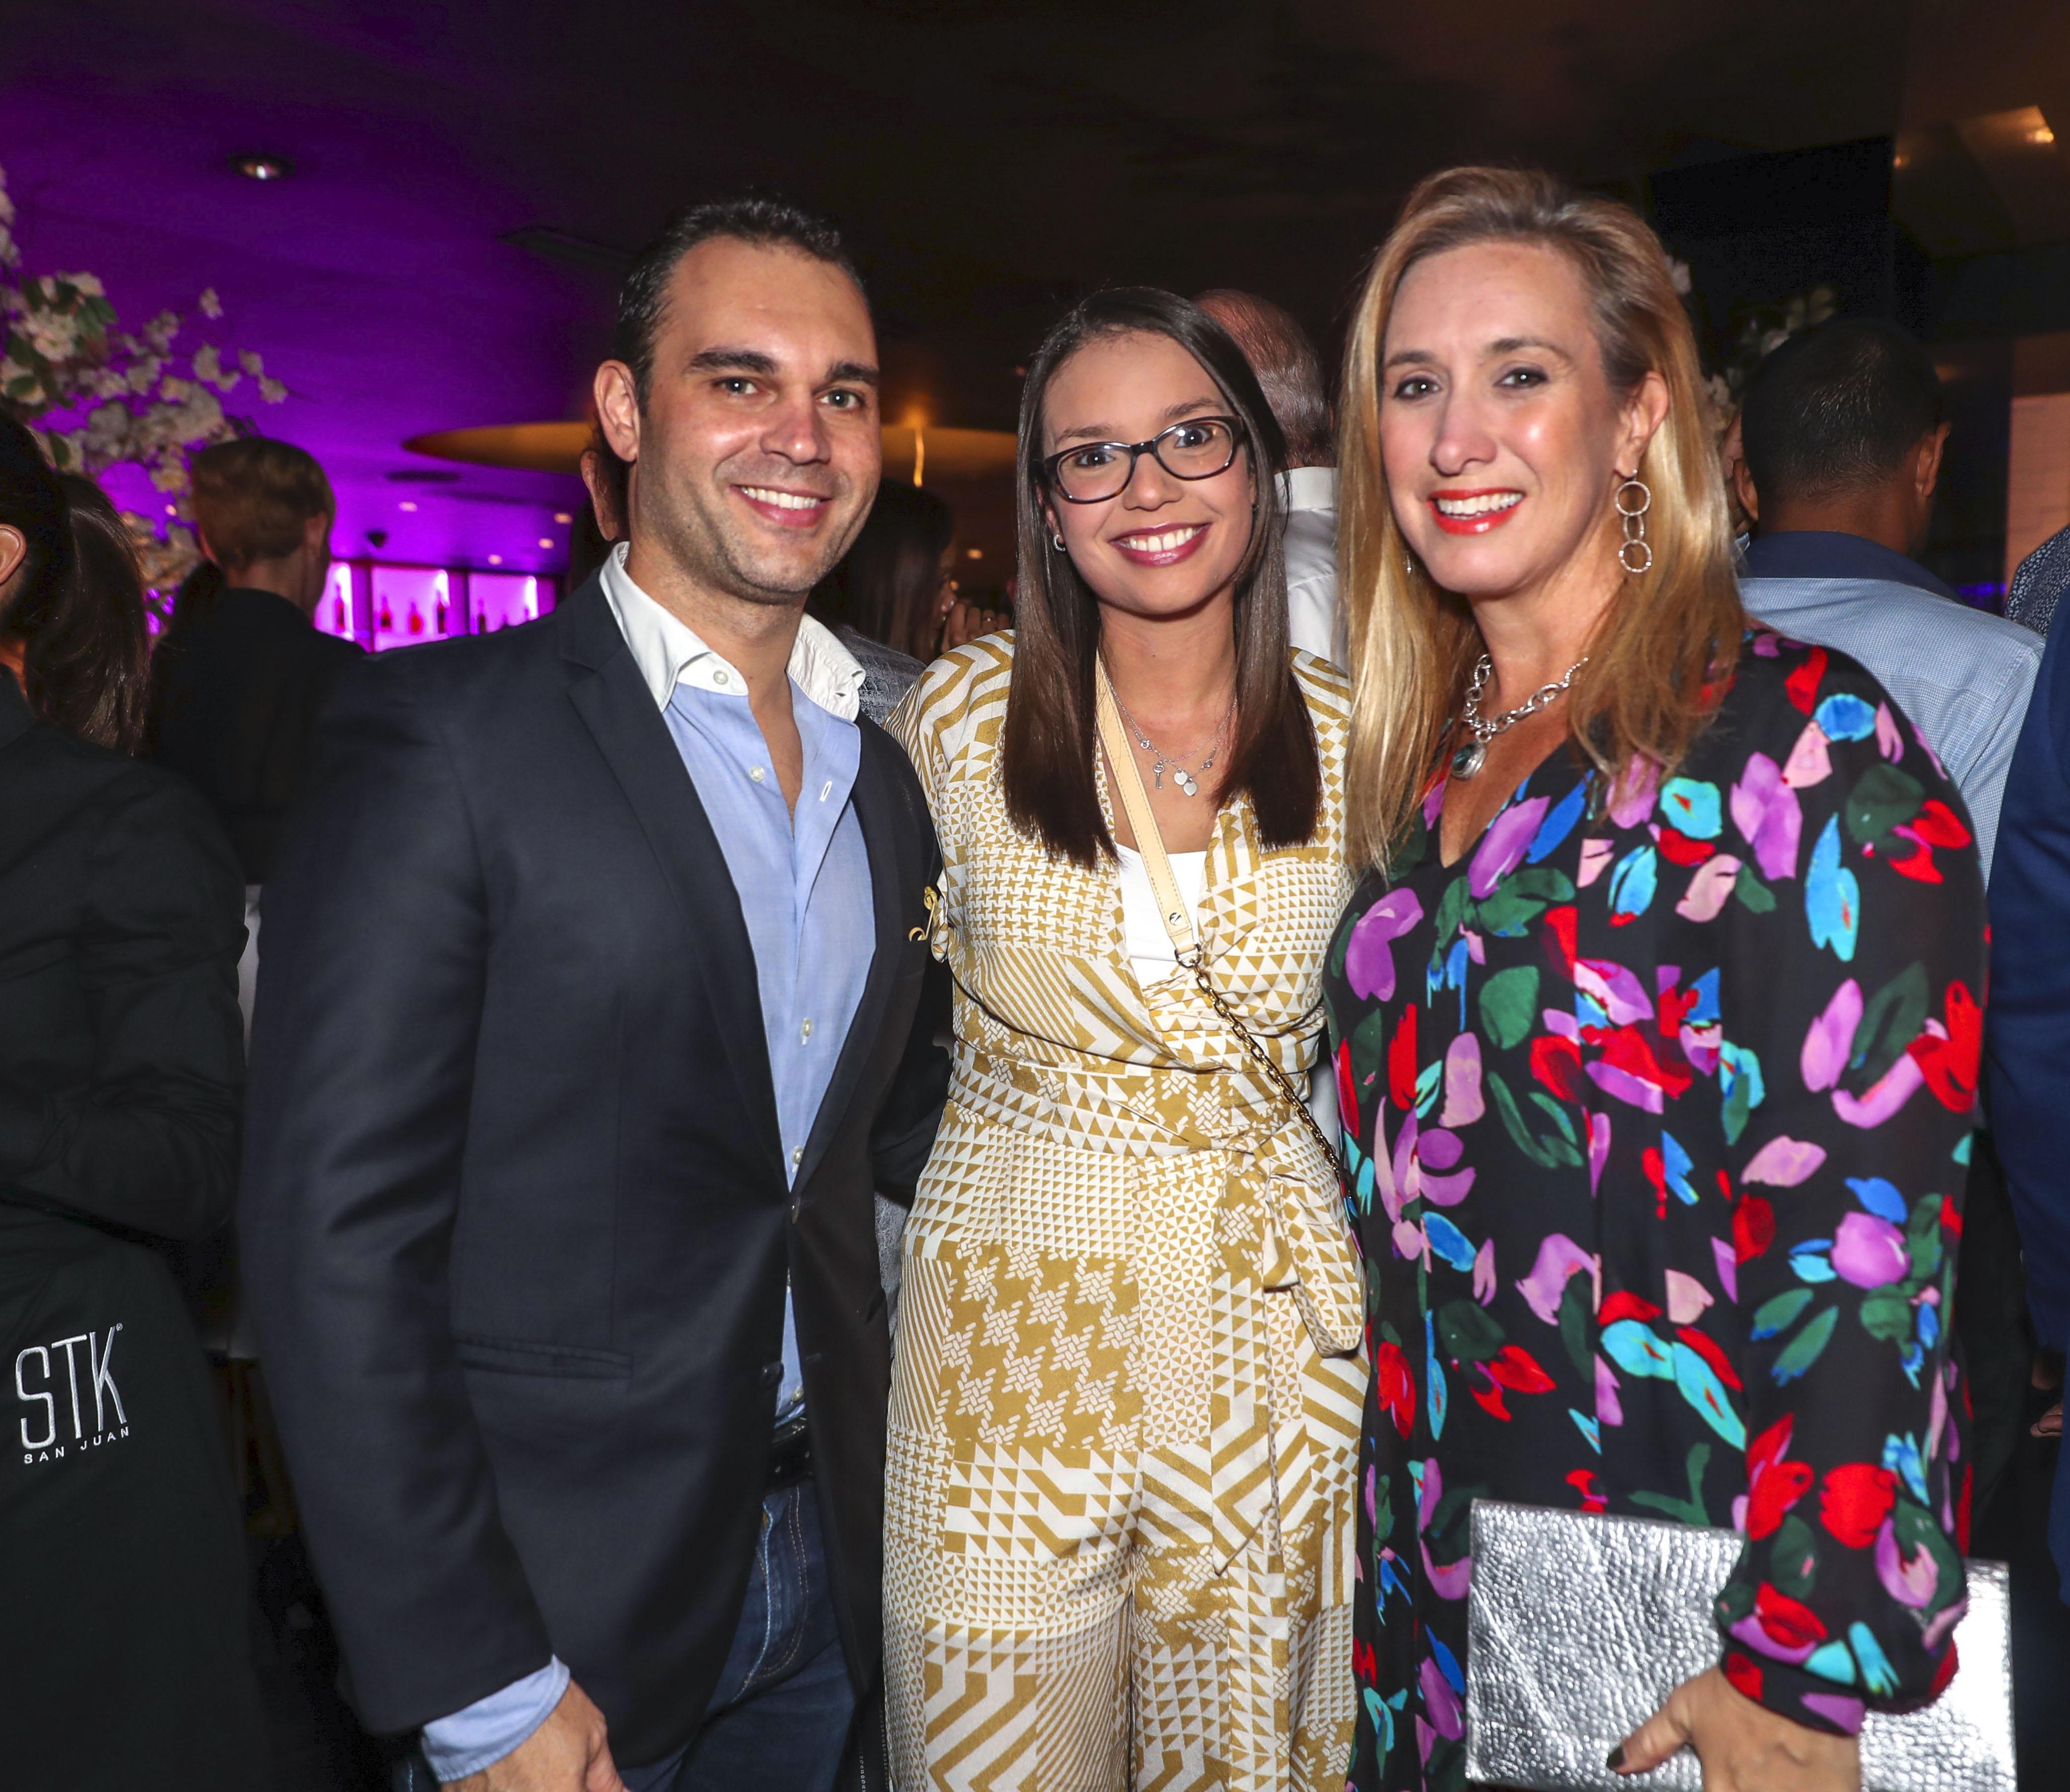 Jennifer Garity, Marian Rodríguez y Juan G. Rullán. (Suministrada)